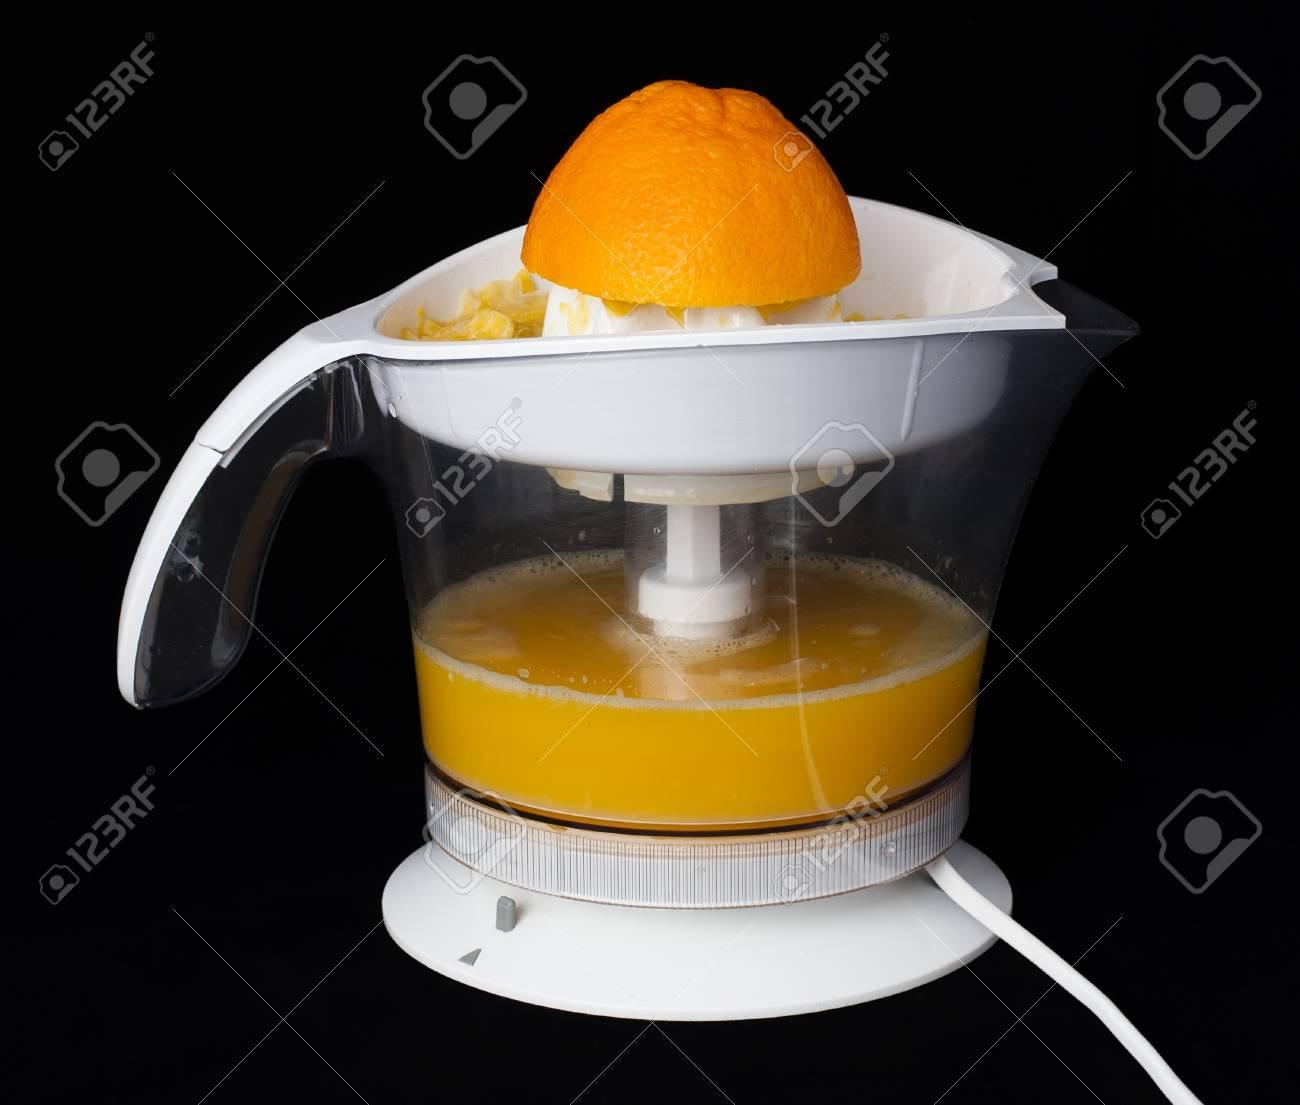 White citrus Juicer and oranges. Black background Stock Photo - 11690258